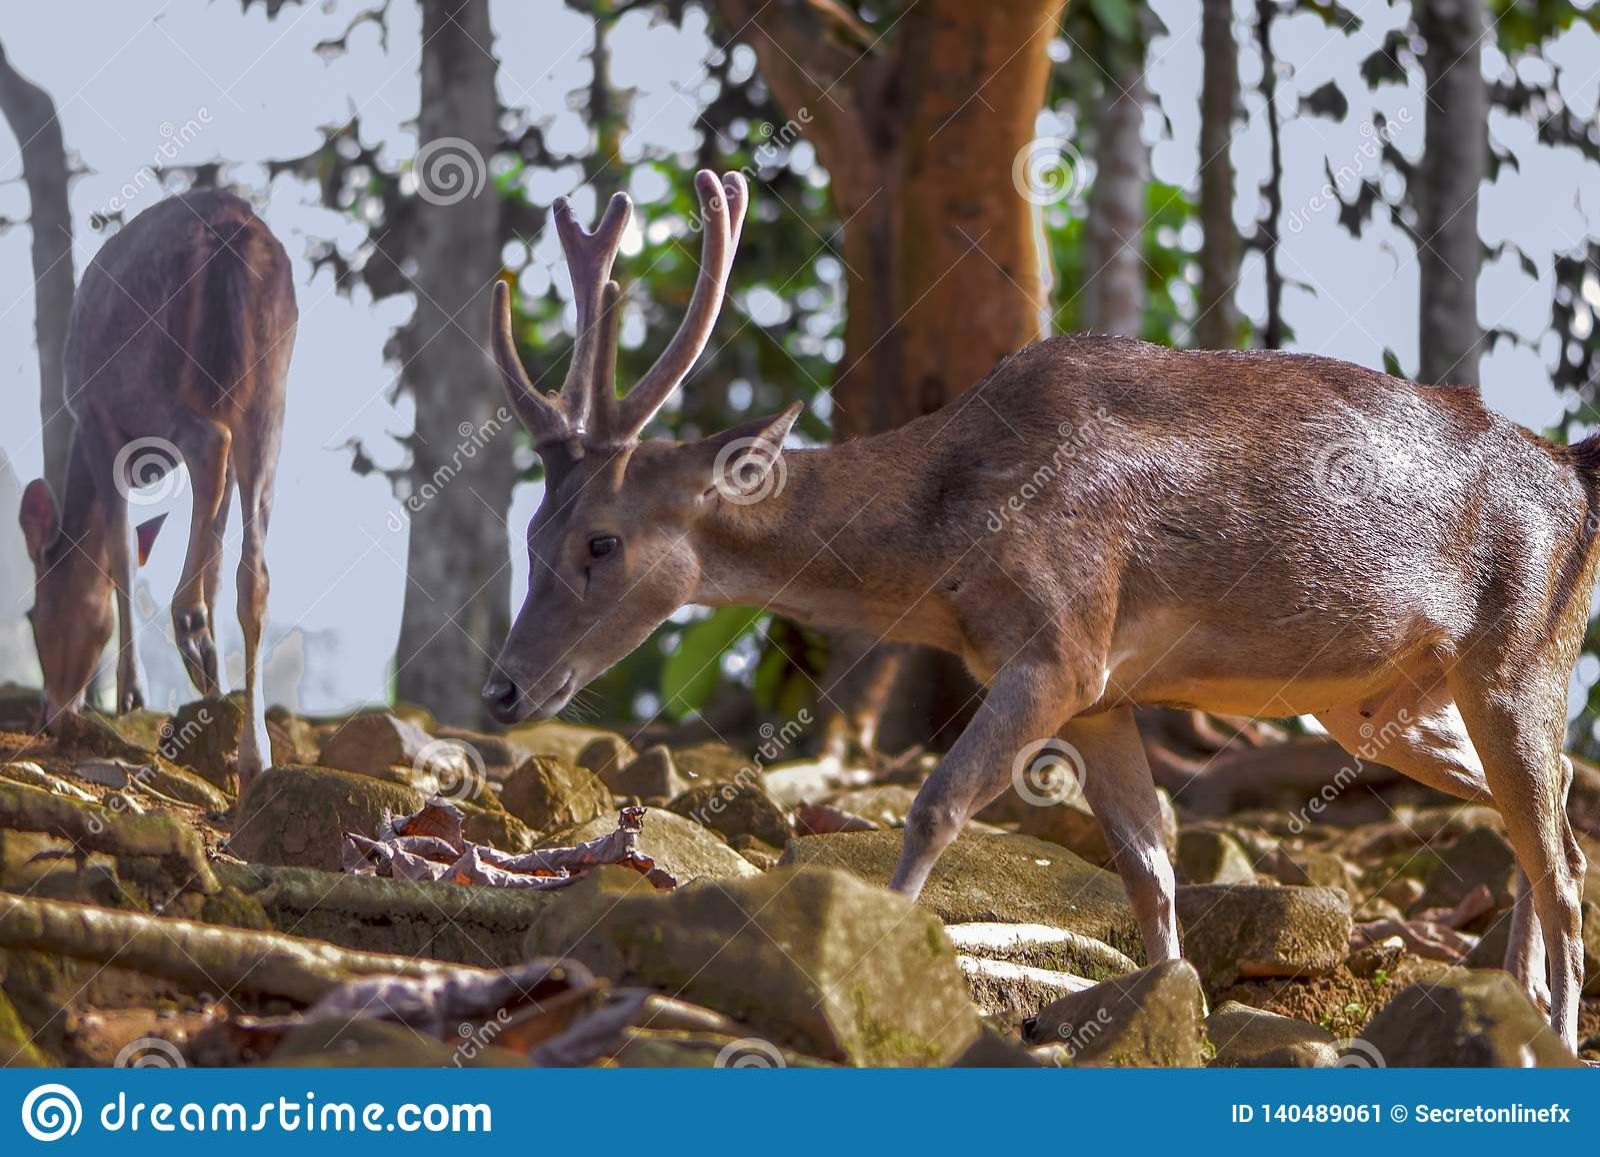 Deer in the forest wildlife